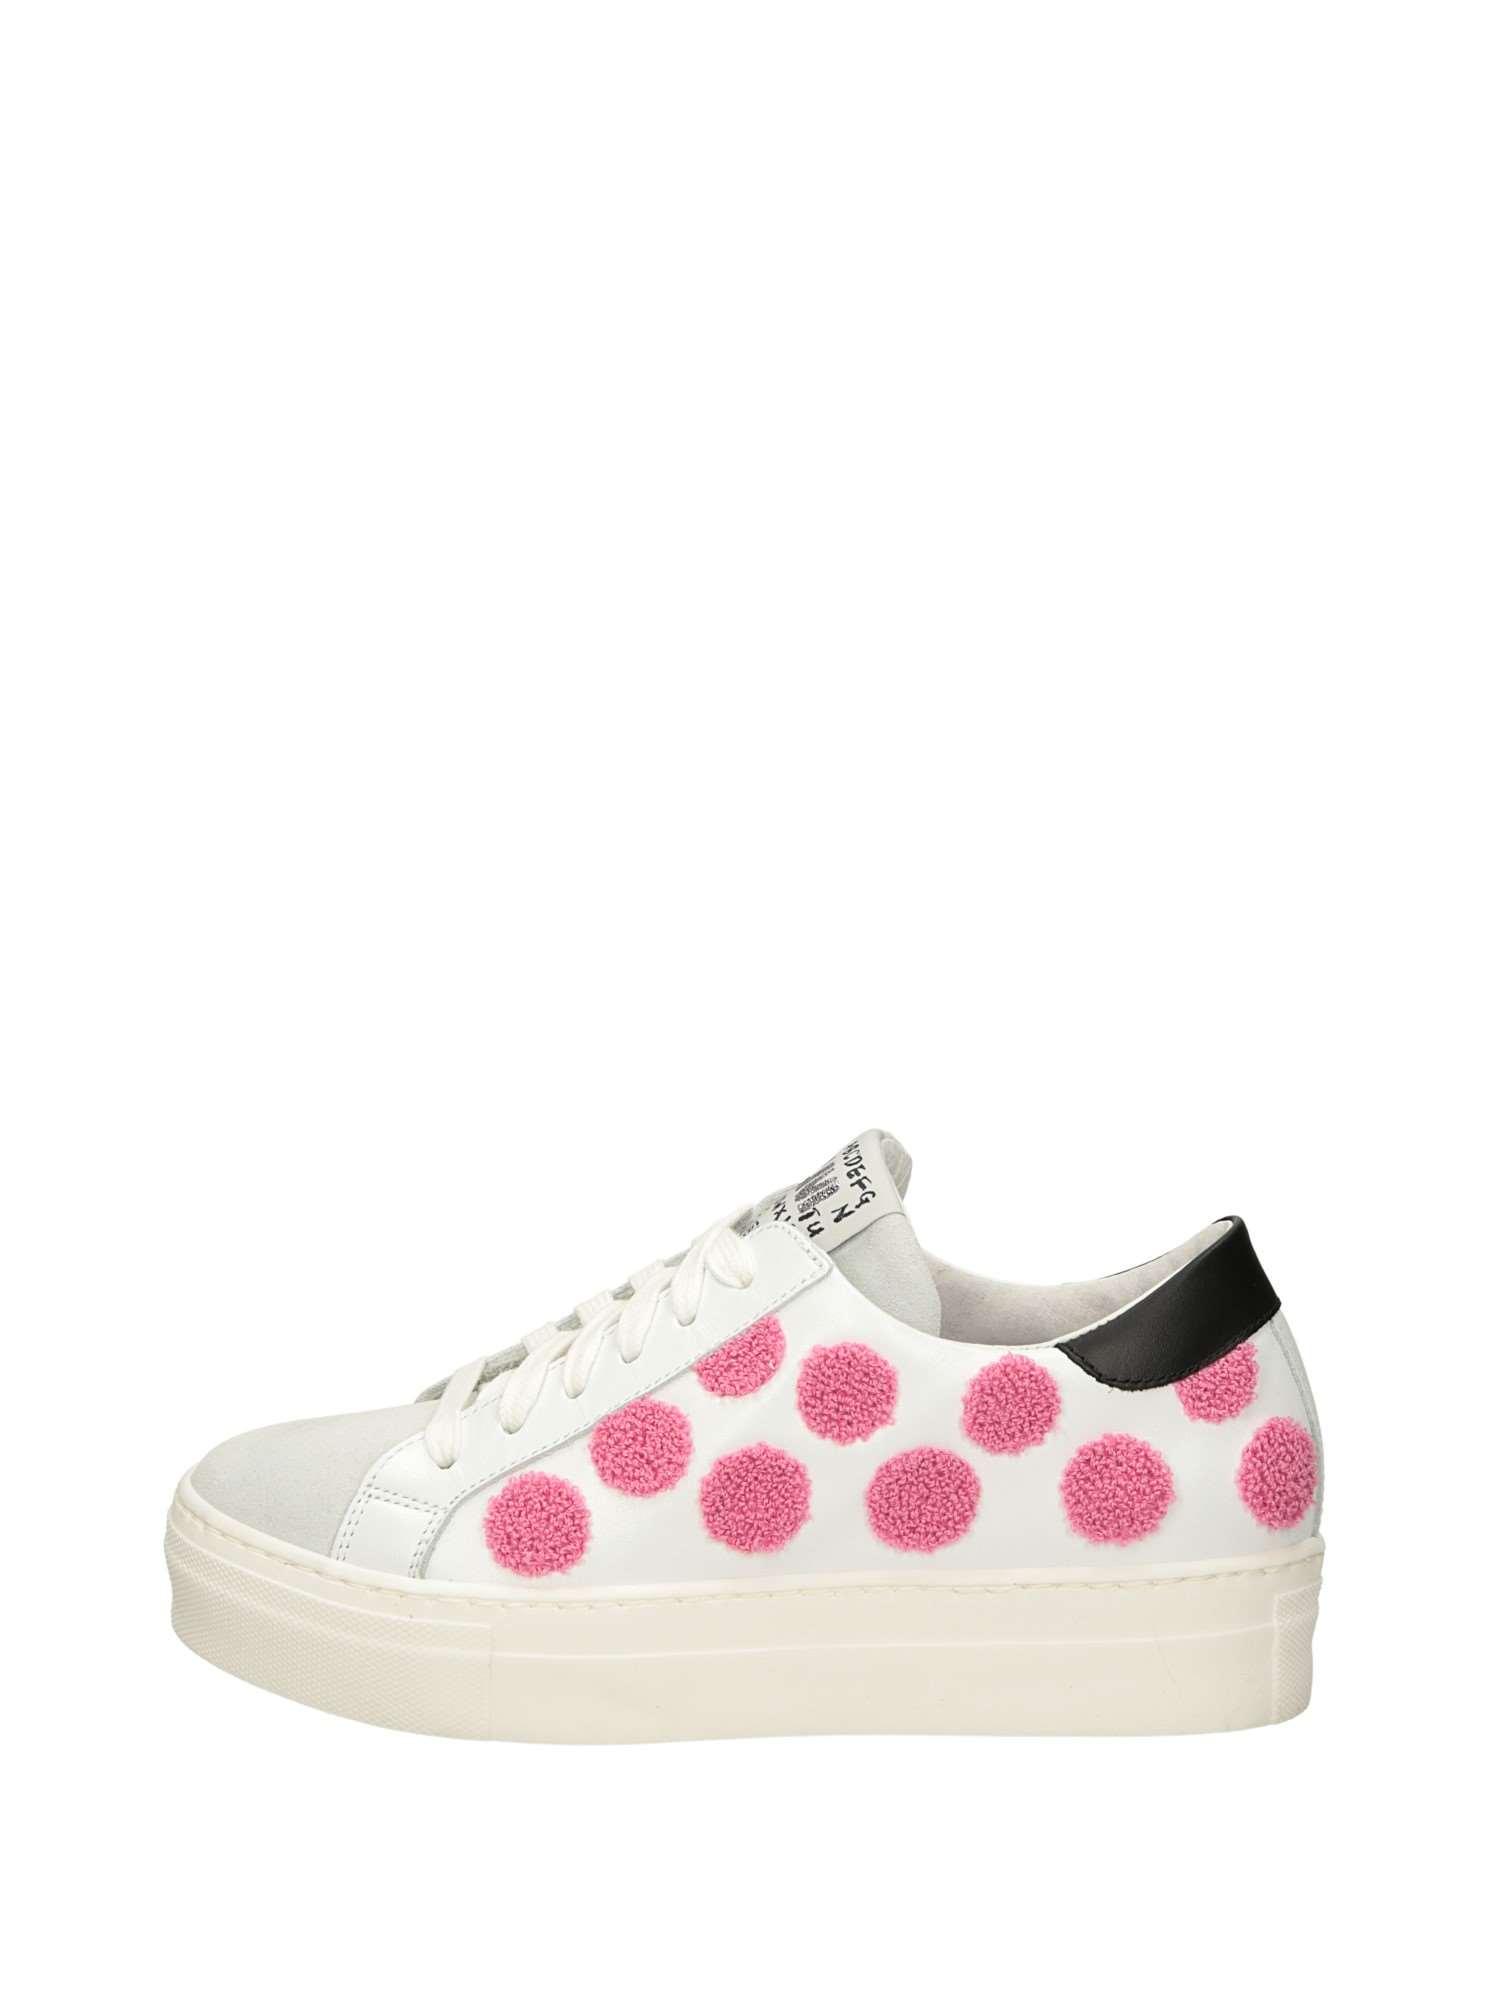 scarpe sportive 12da0 15a2d Meline Sneakers Basse Donna Bianco Rosa   Lalilina